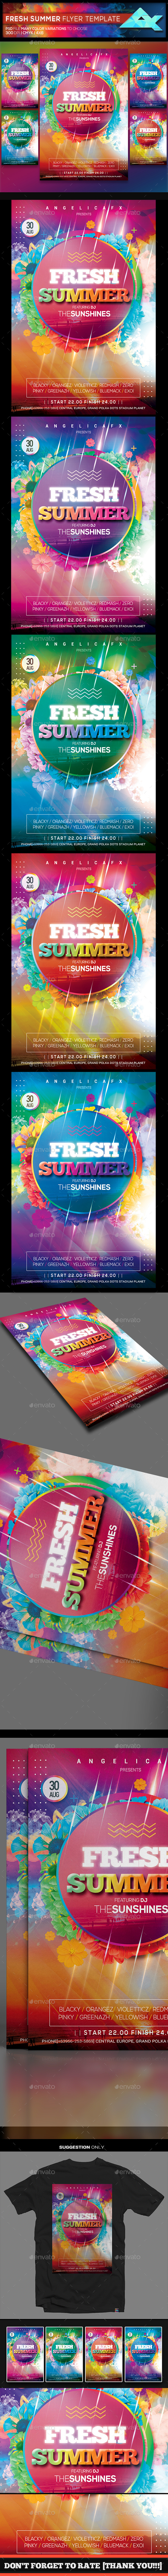 Fresh Summer Photoshop Flyer Template - Flyers Print Templates